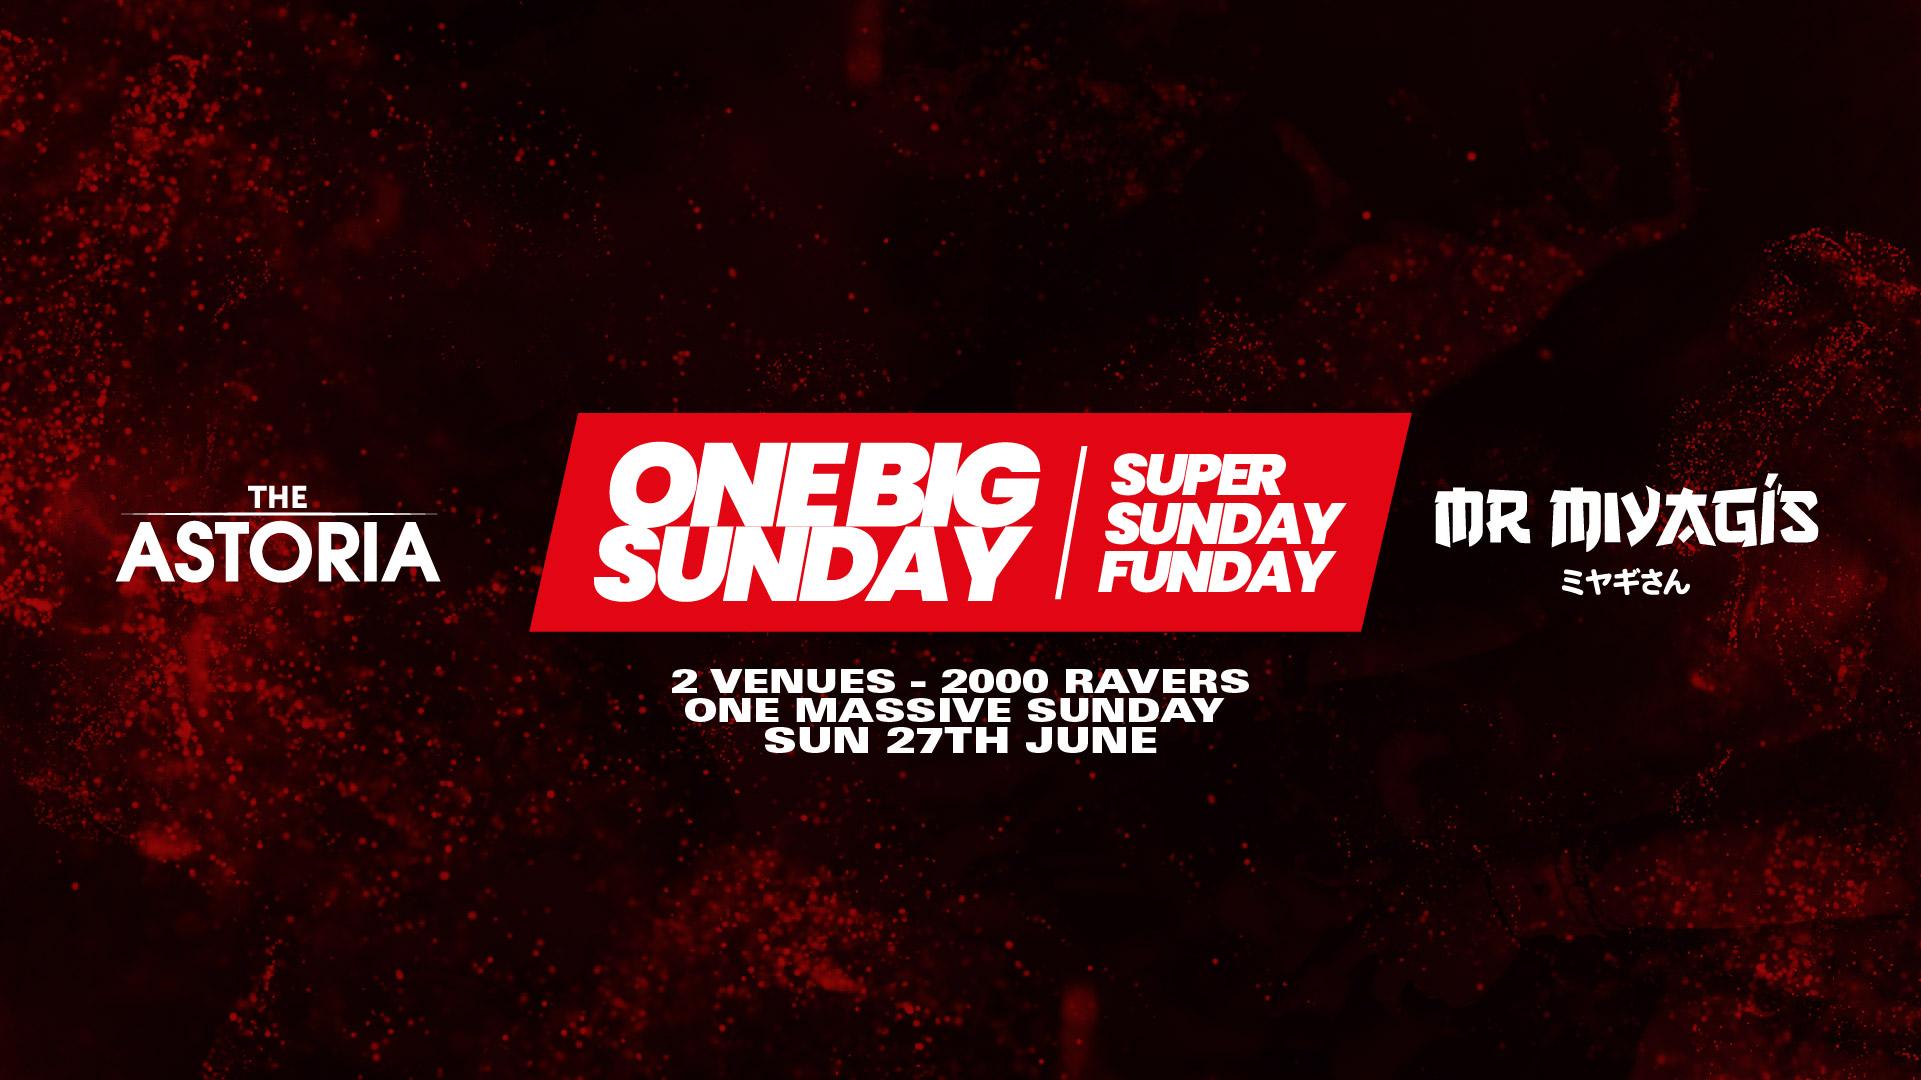 End of Lockdown Super Sunday – 2000 Ravers – The Astoria and Mr Miyaggis